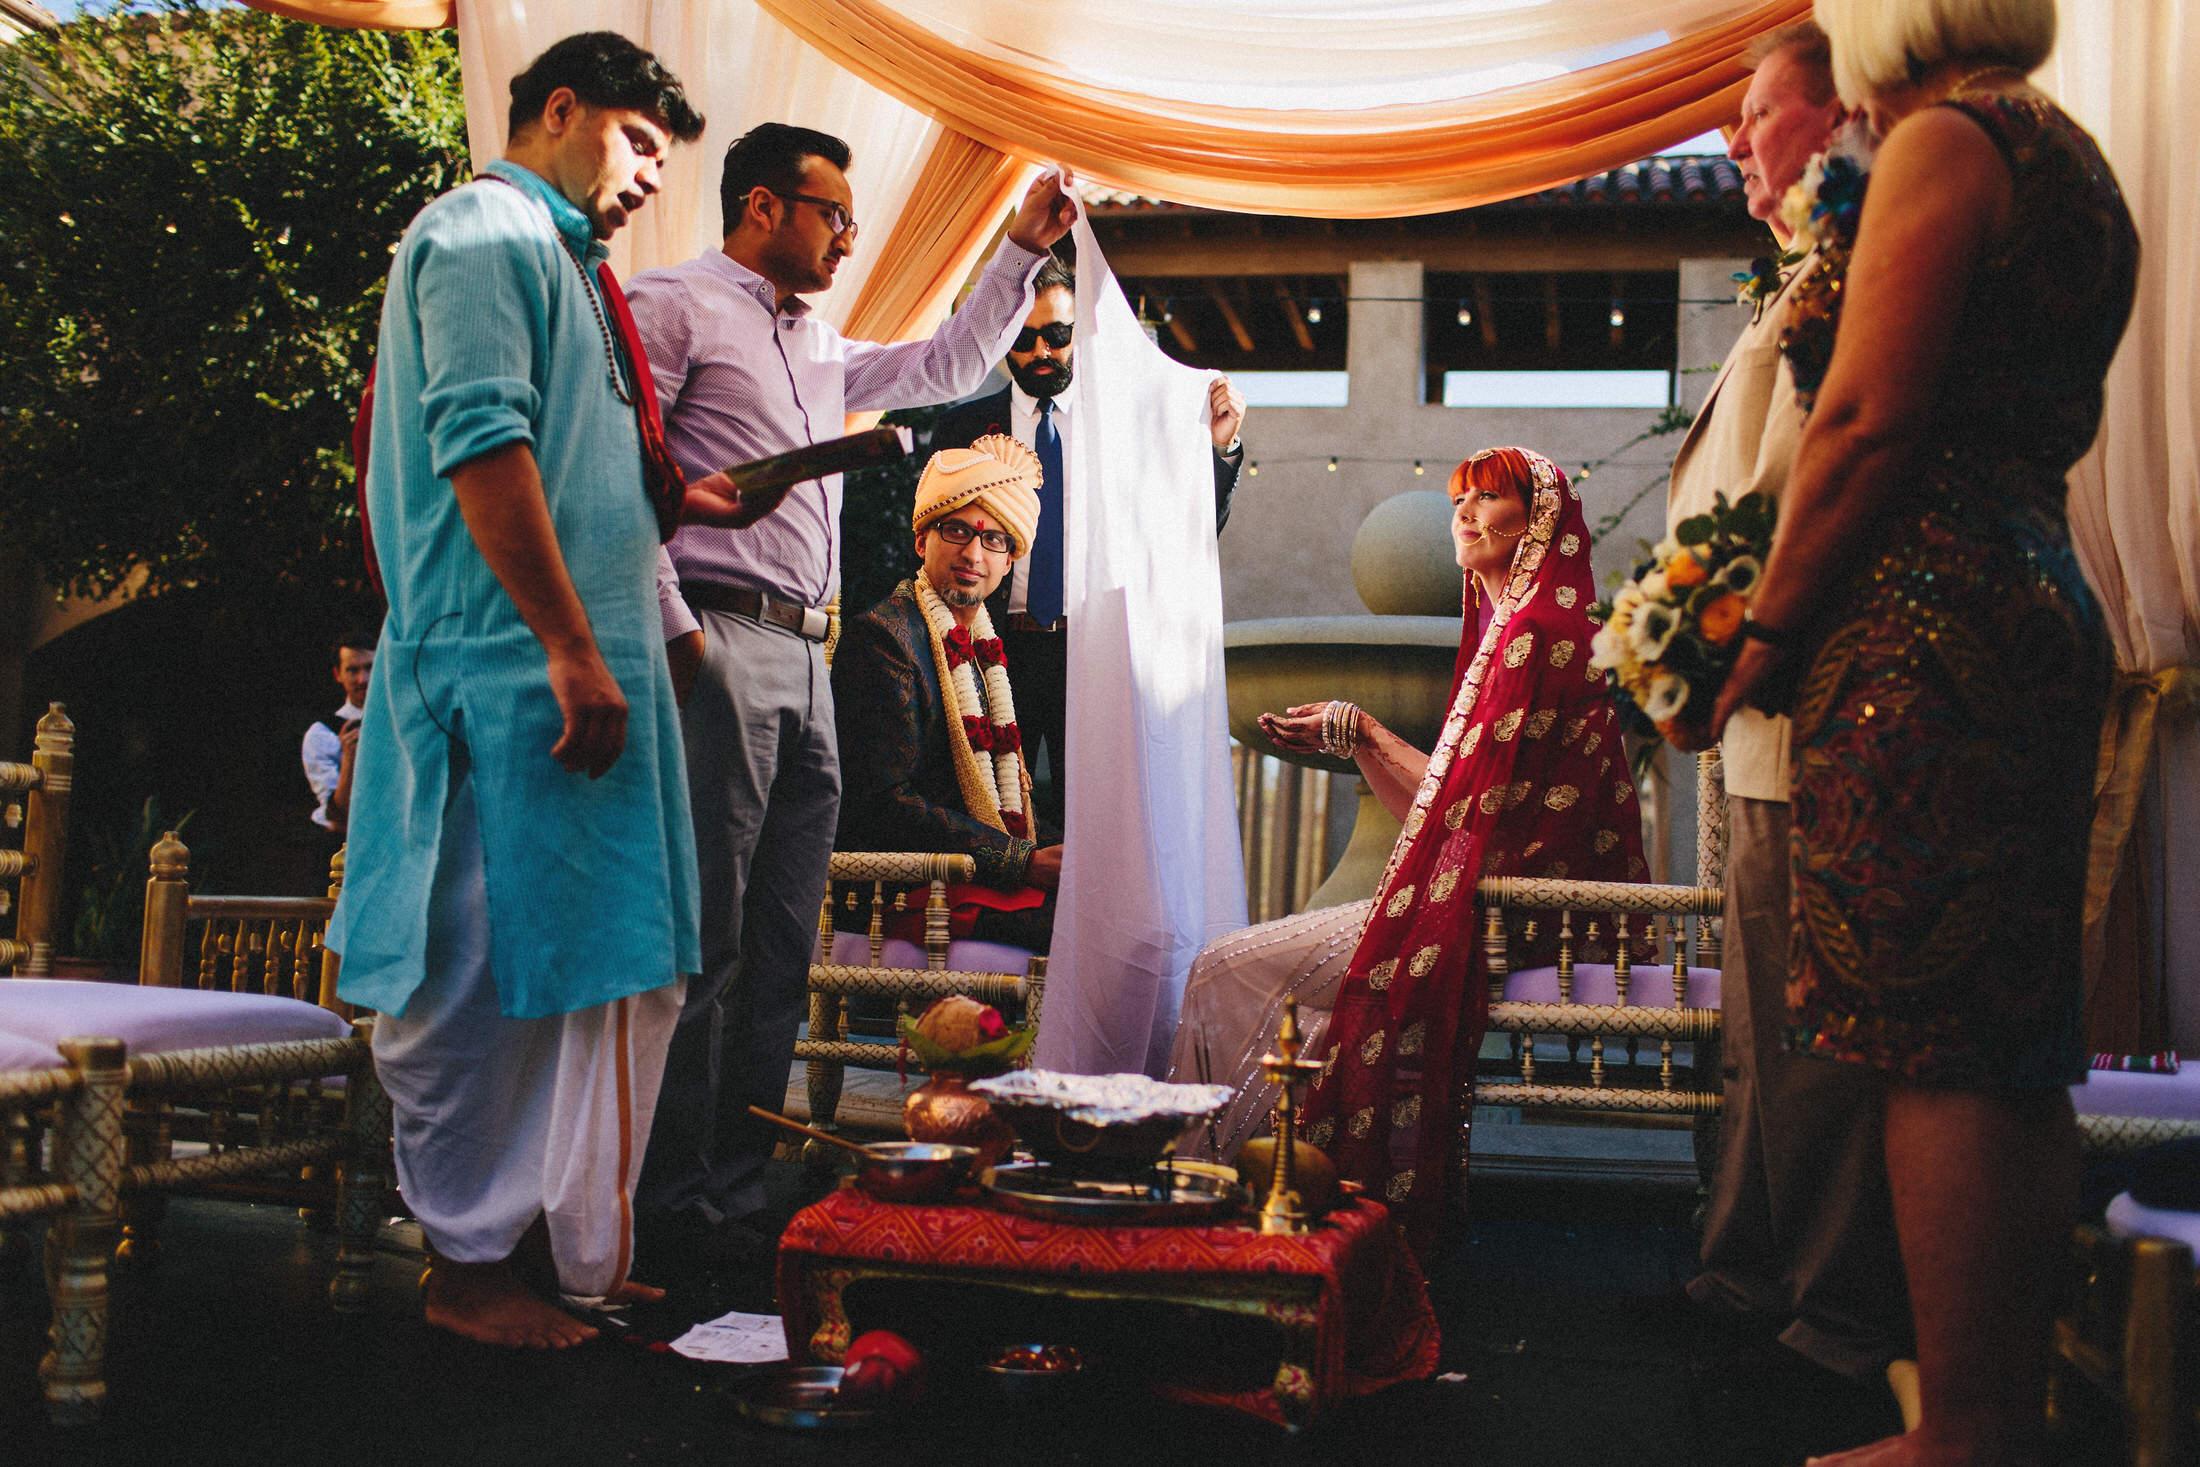 Modern-Indian-Serra-Plaza-wedding-056.jpg